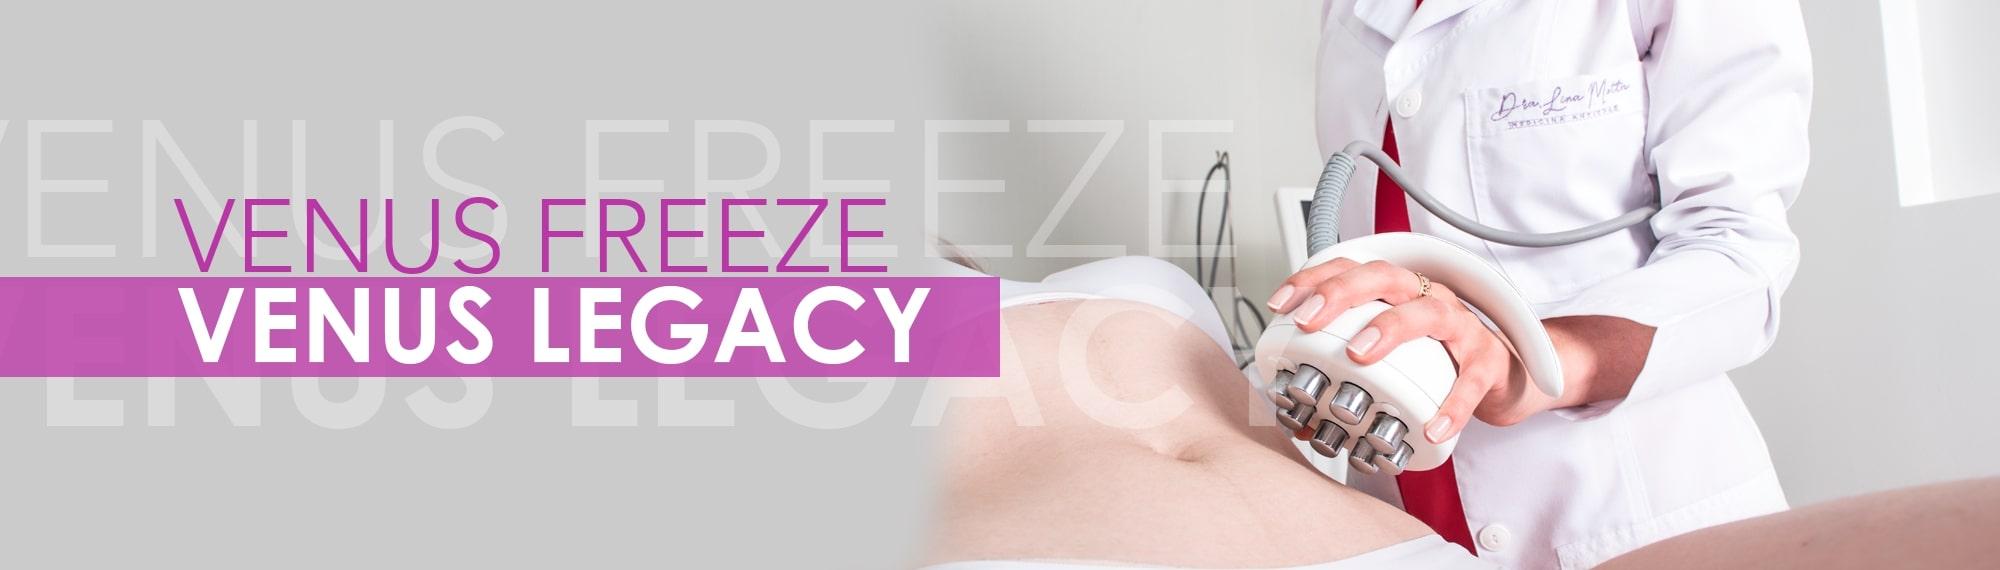 Venus Freeze - Venus Legacy